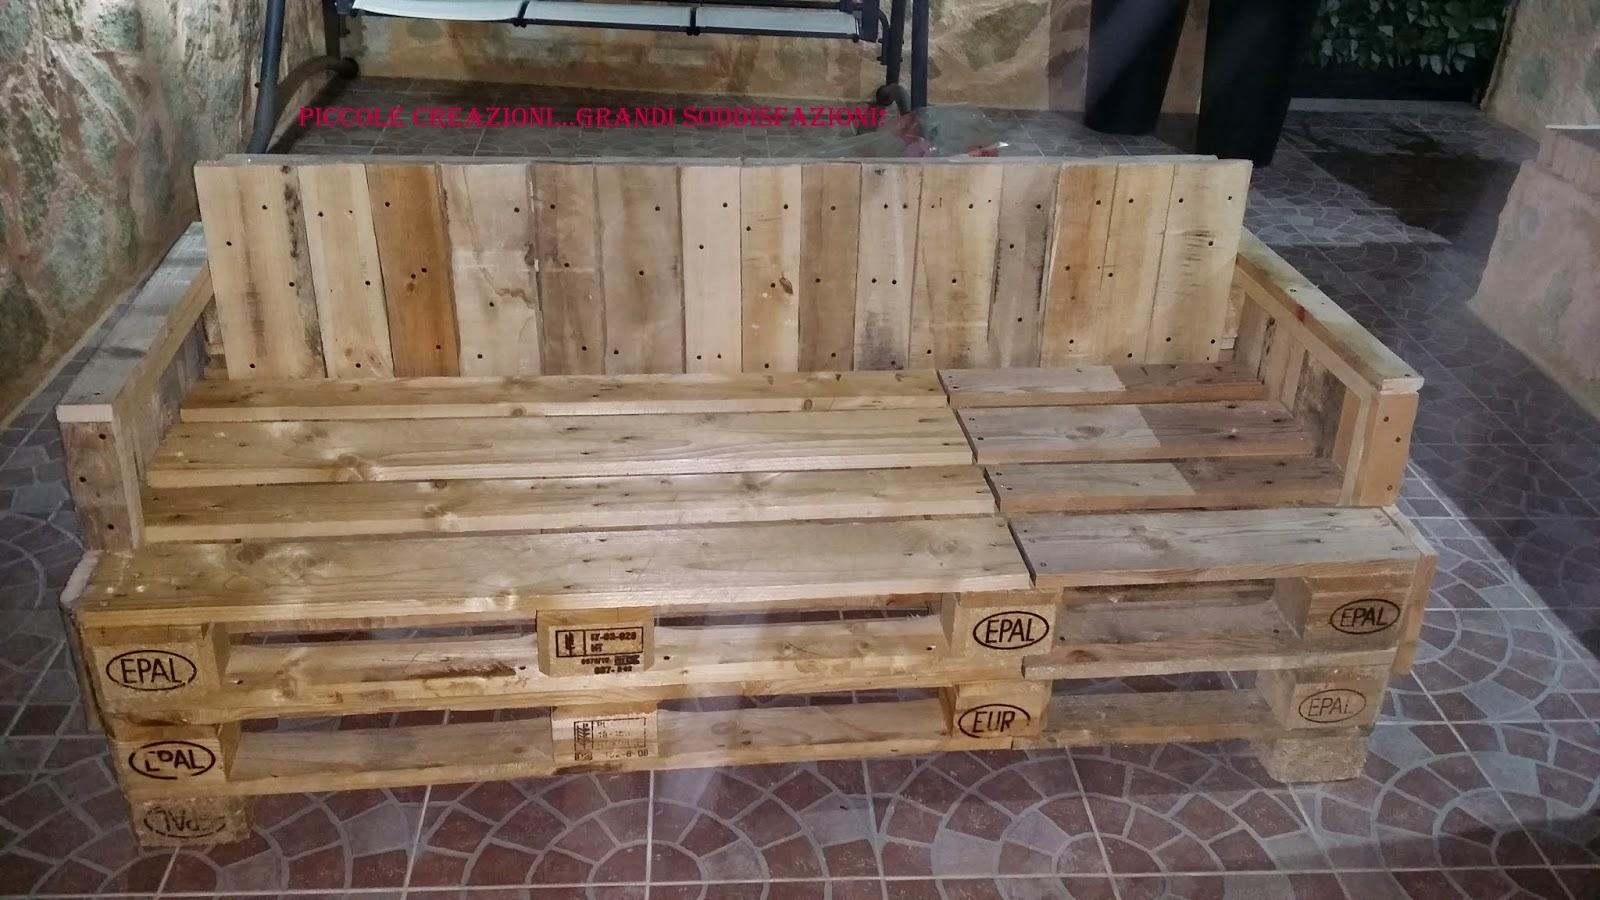 Panchine Da Giardino Colorate.Panchine Da Giardino Prezzi Offerte Tavoli Da Giardino Leroy Merlin